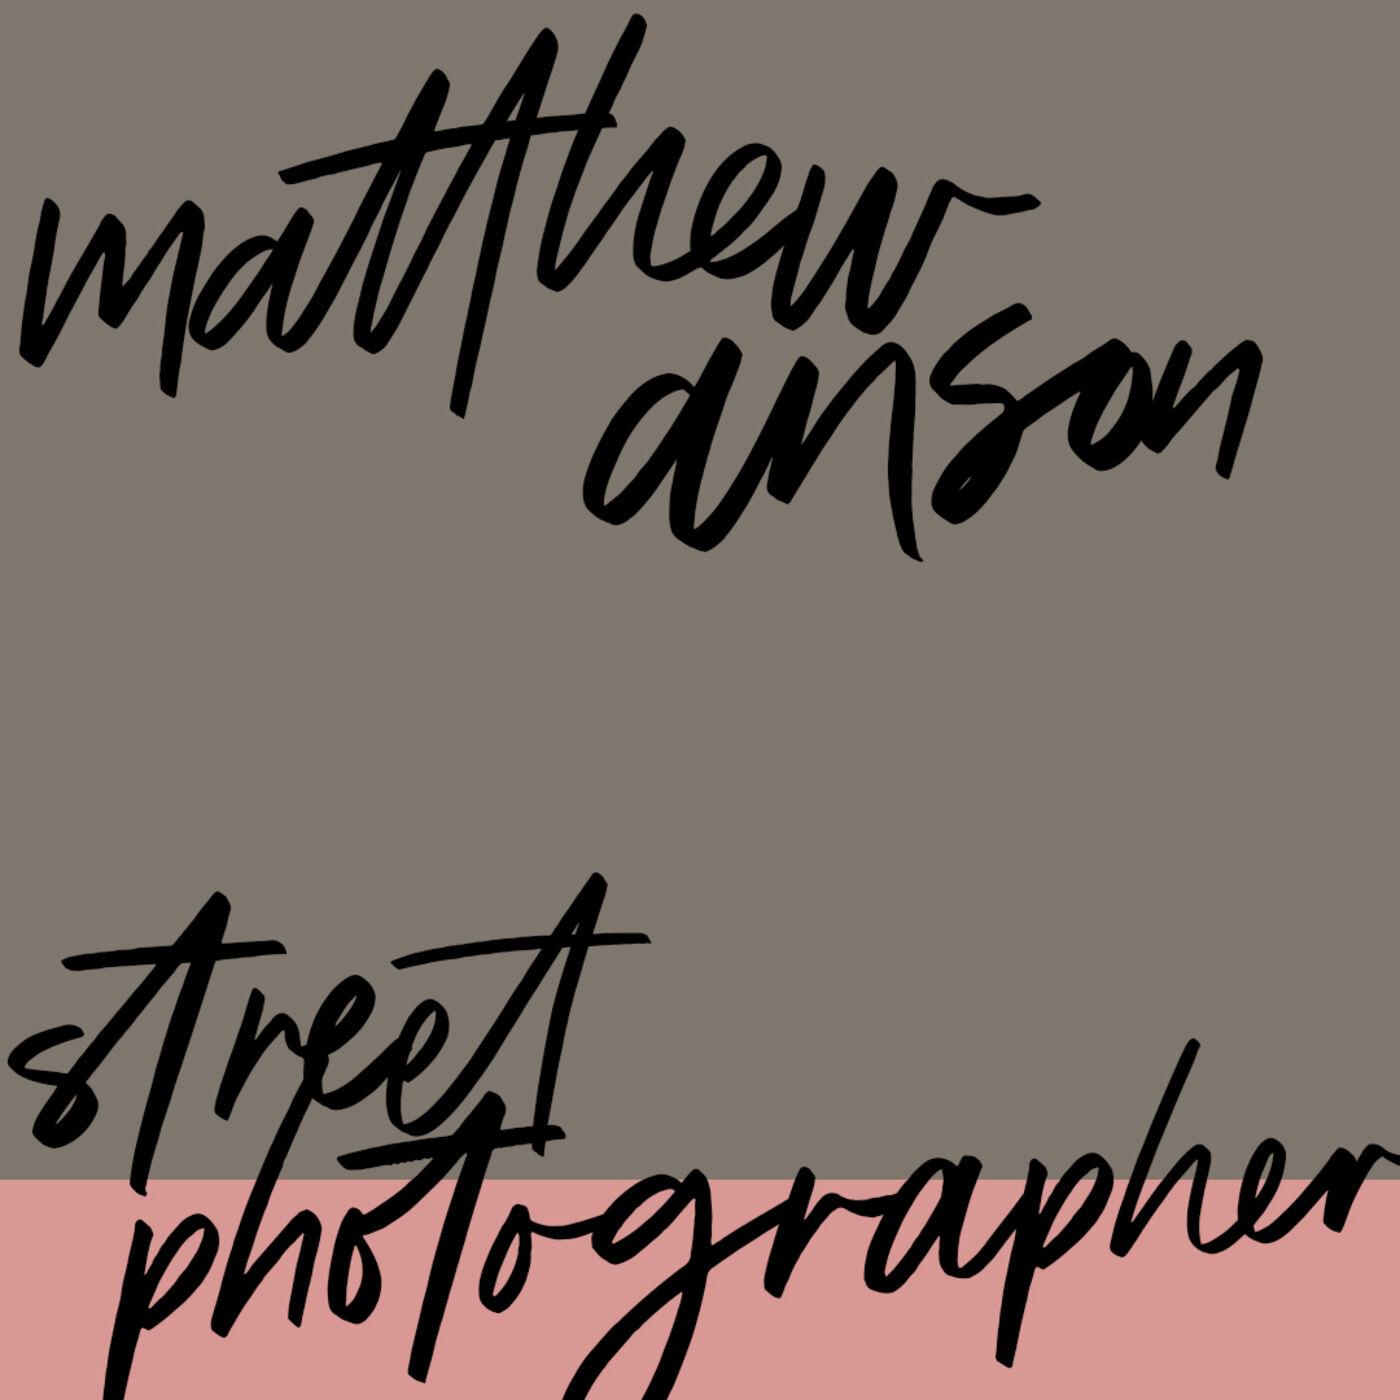 #68: Street Photographer: Matthew Anson: Capturing Time